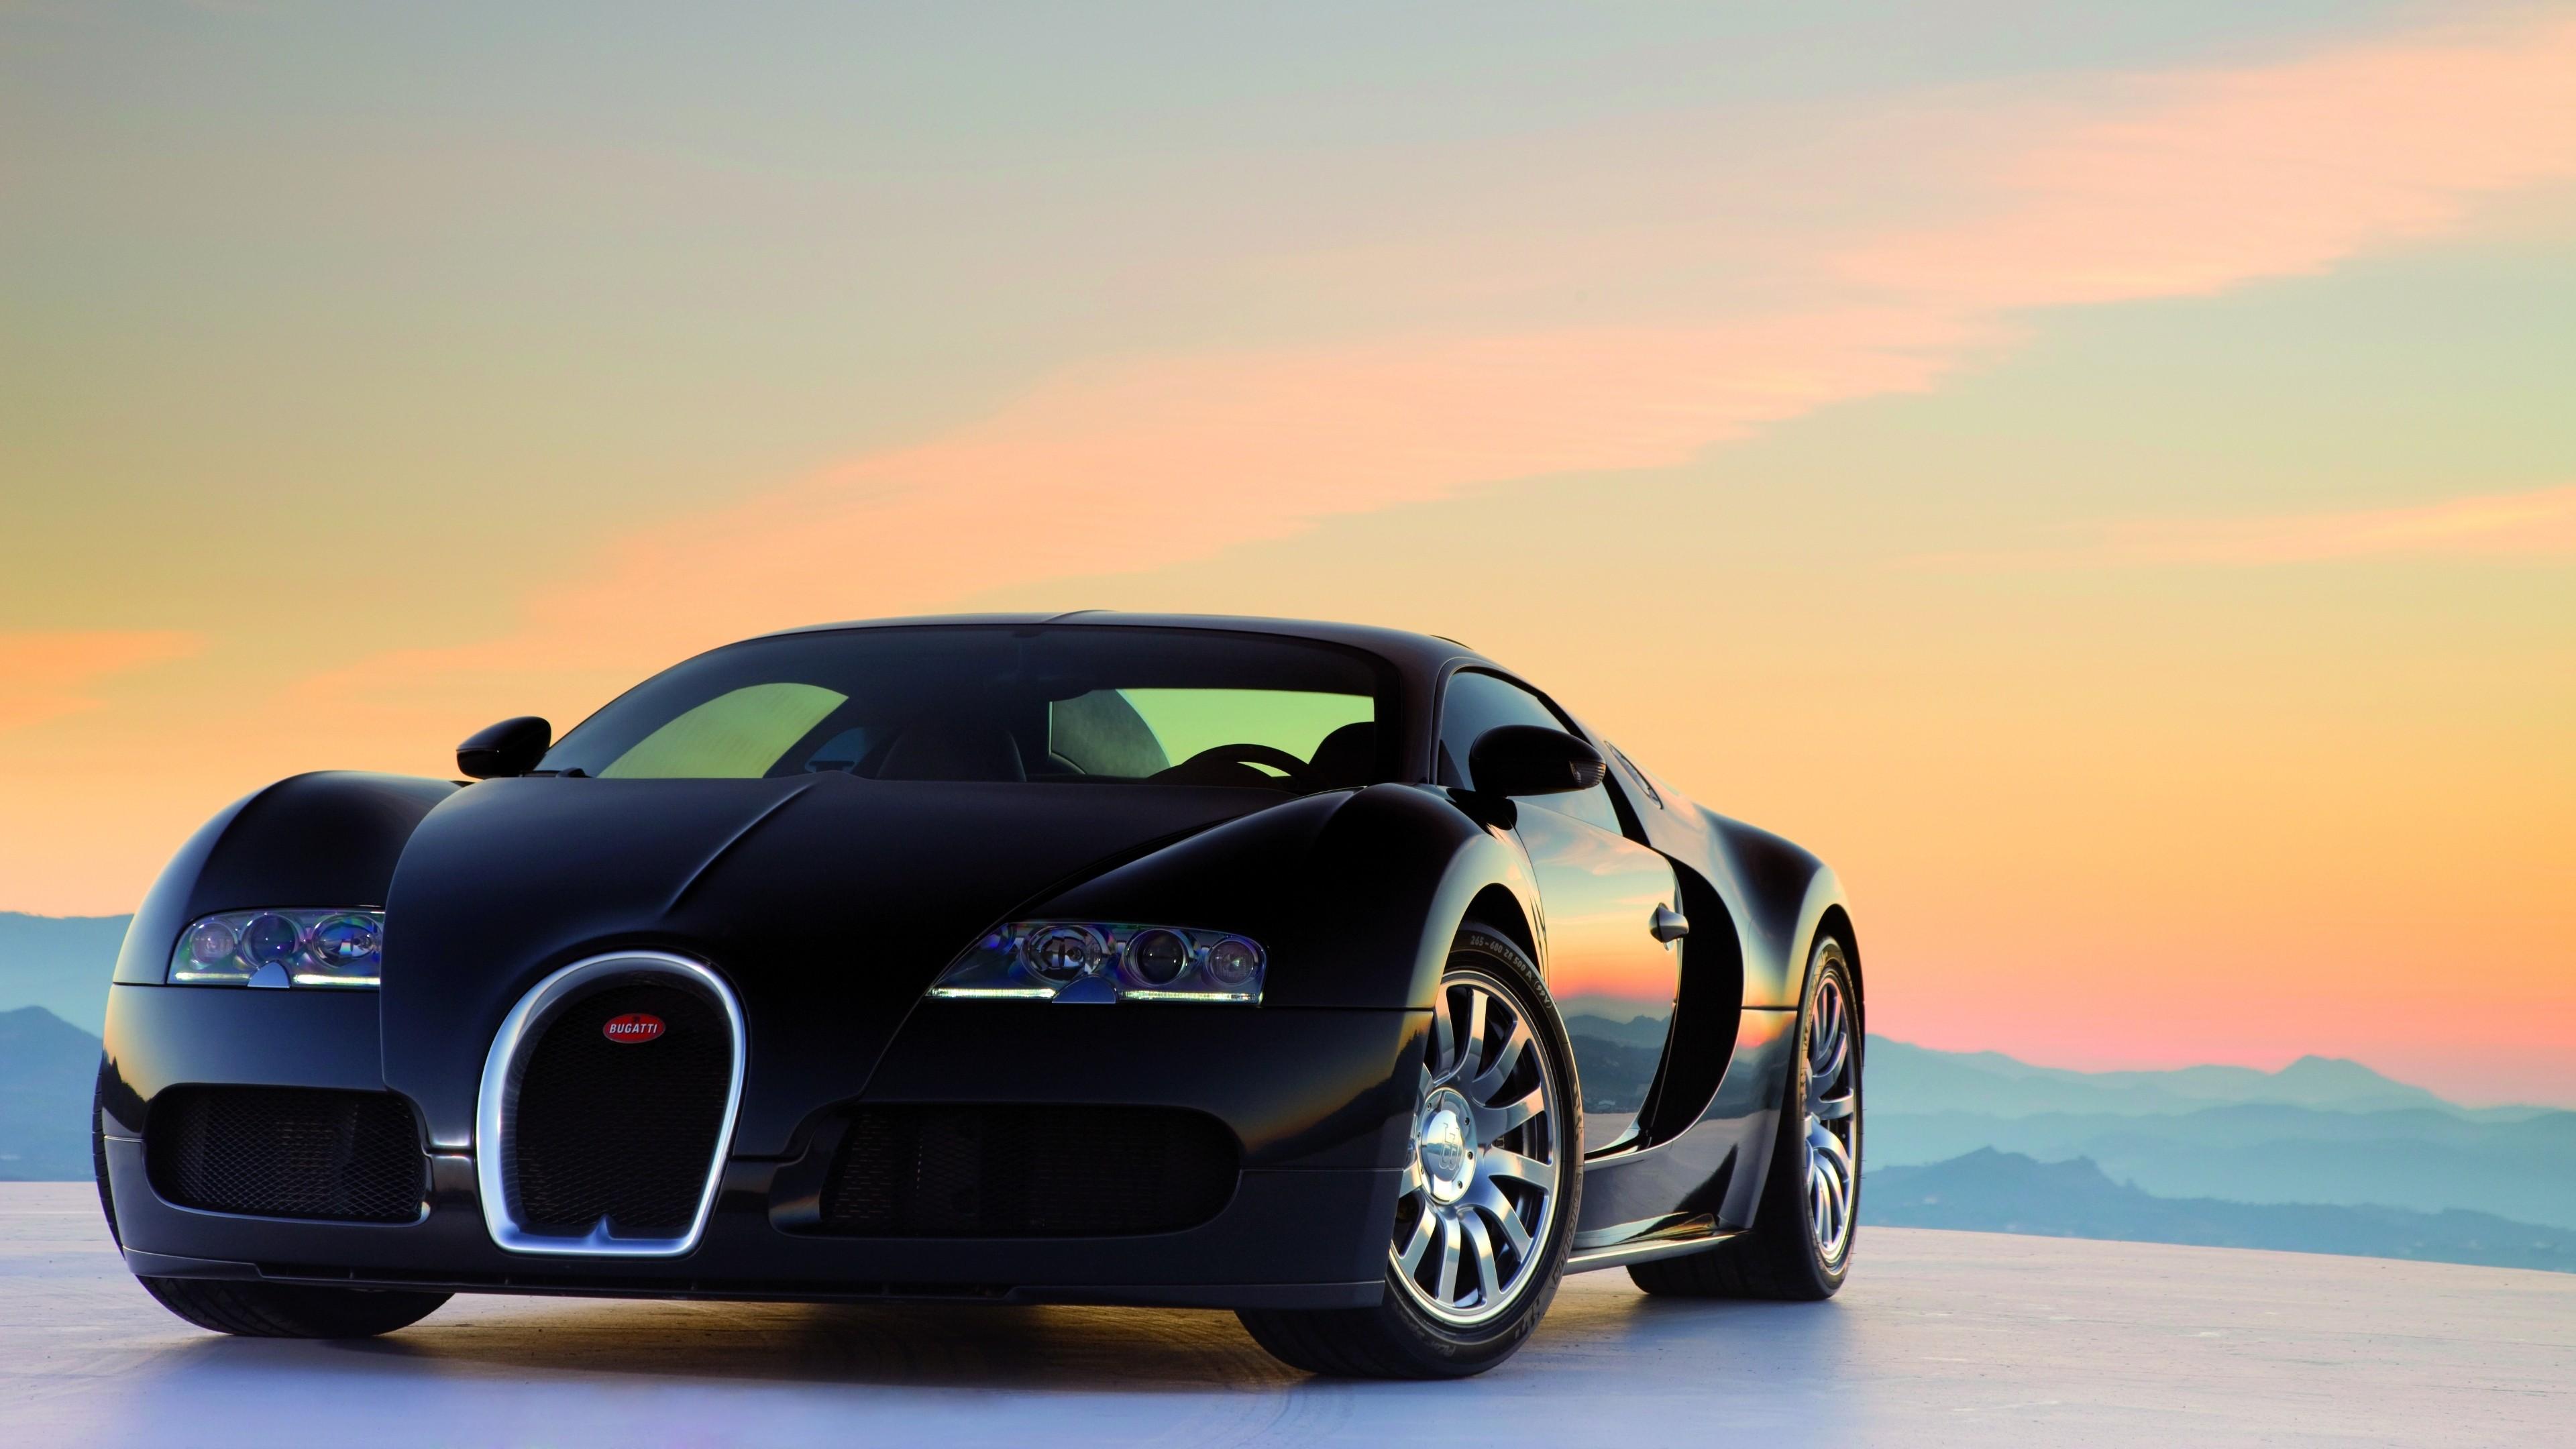 Bugatti Veyron Wallpaper 47